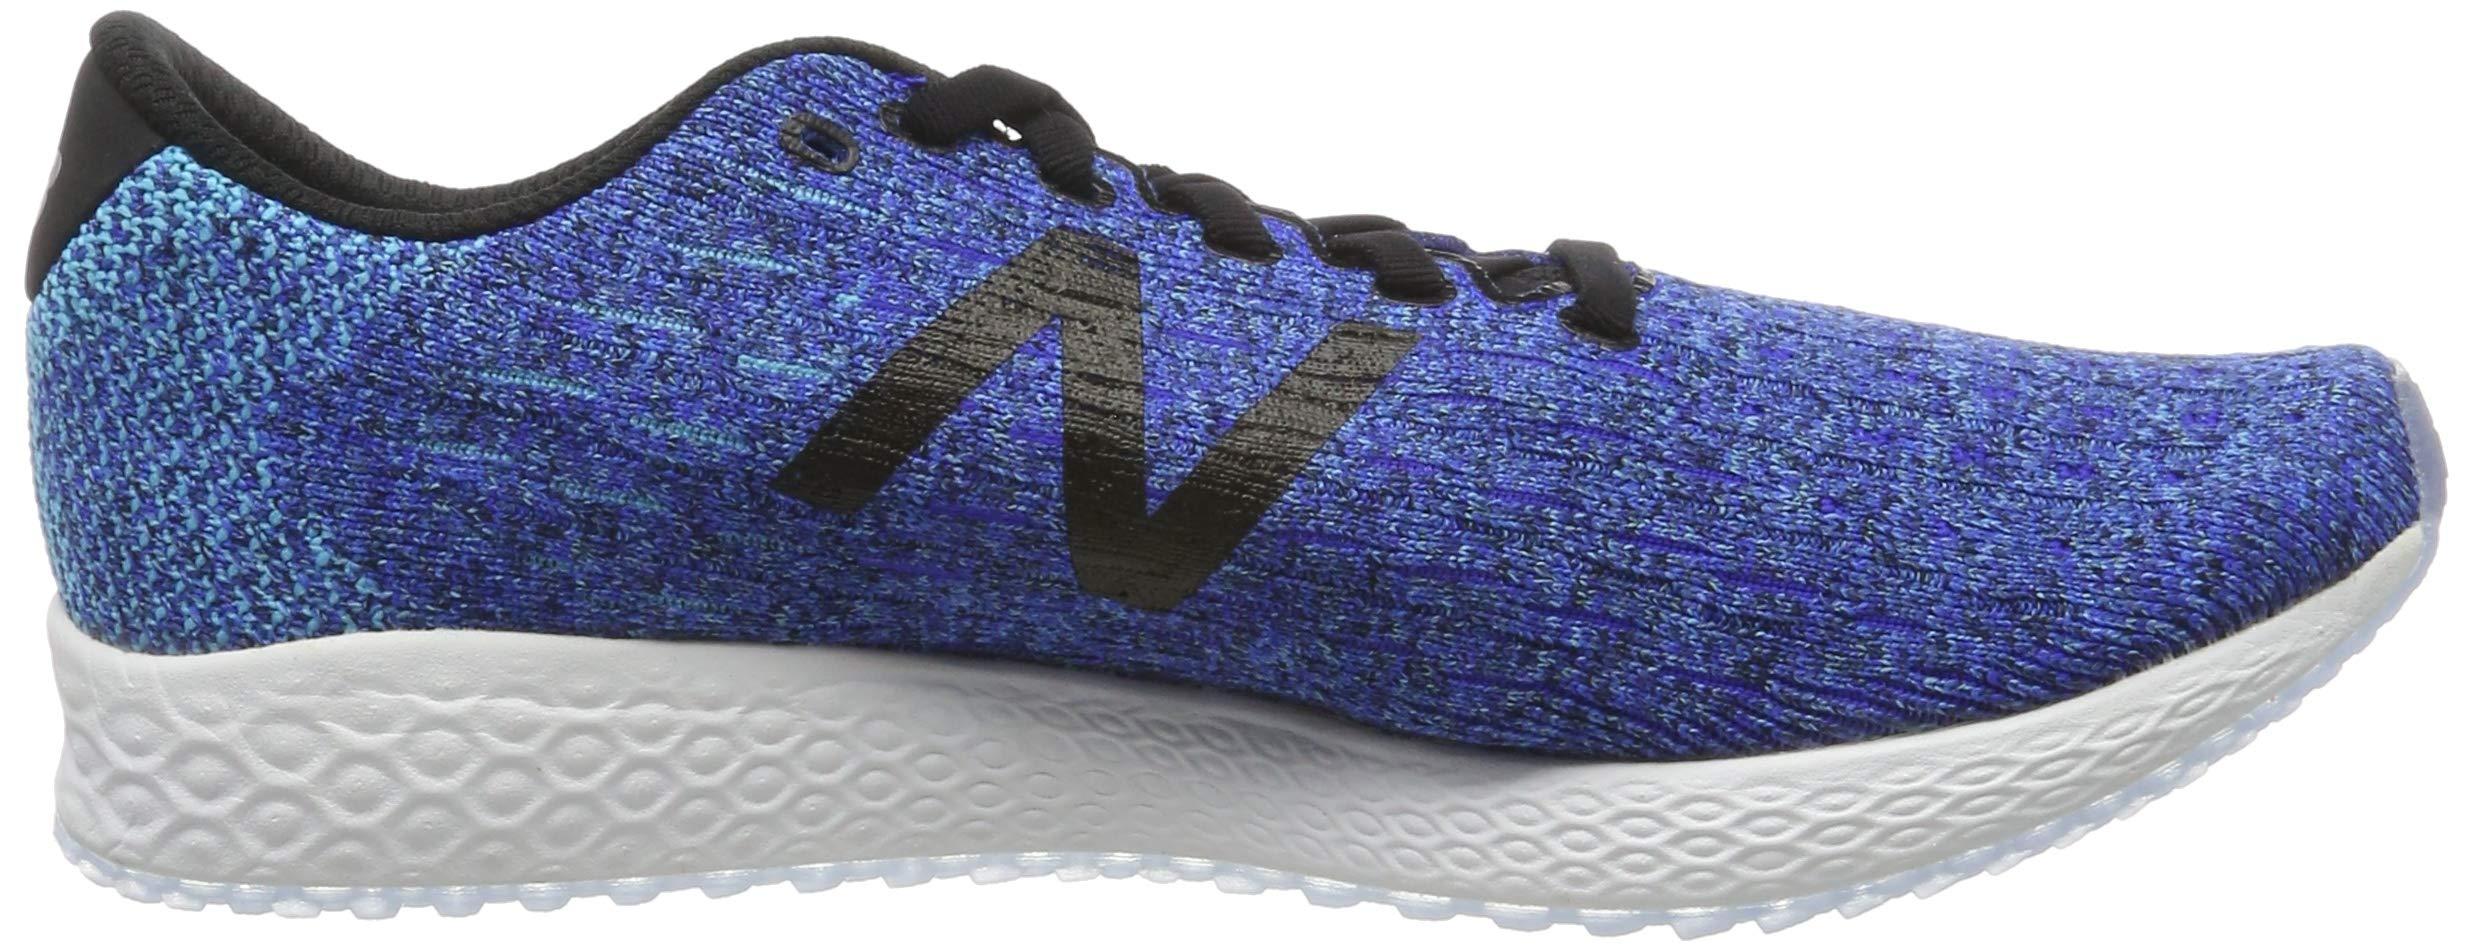 81IDh5q5vwL - New Balance Men's Zante Pursuit V1 Fresh Foam Running Shoe